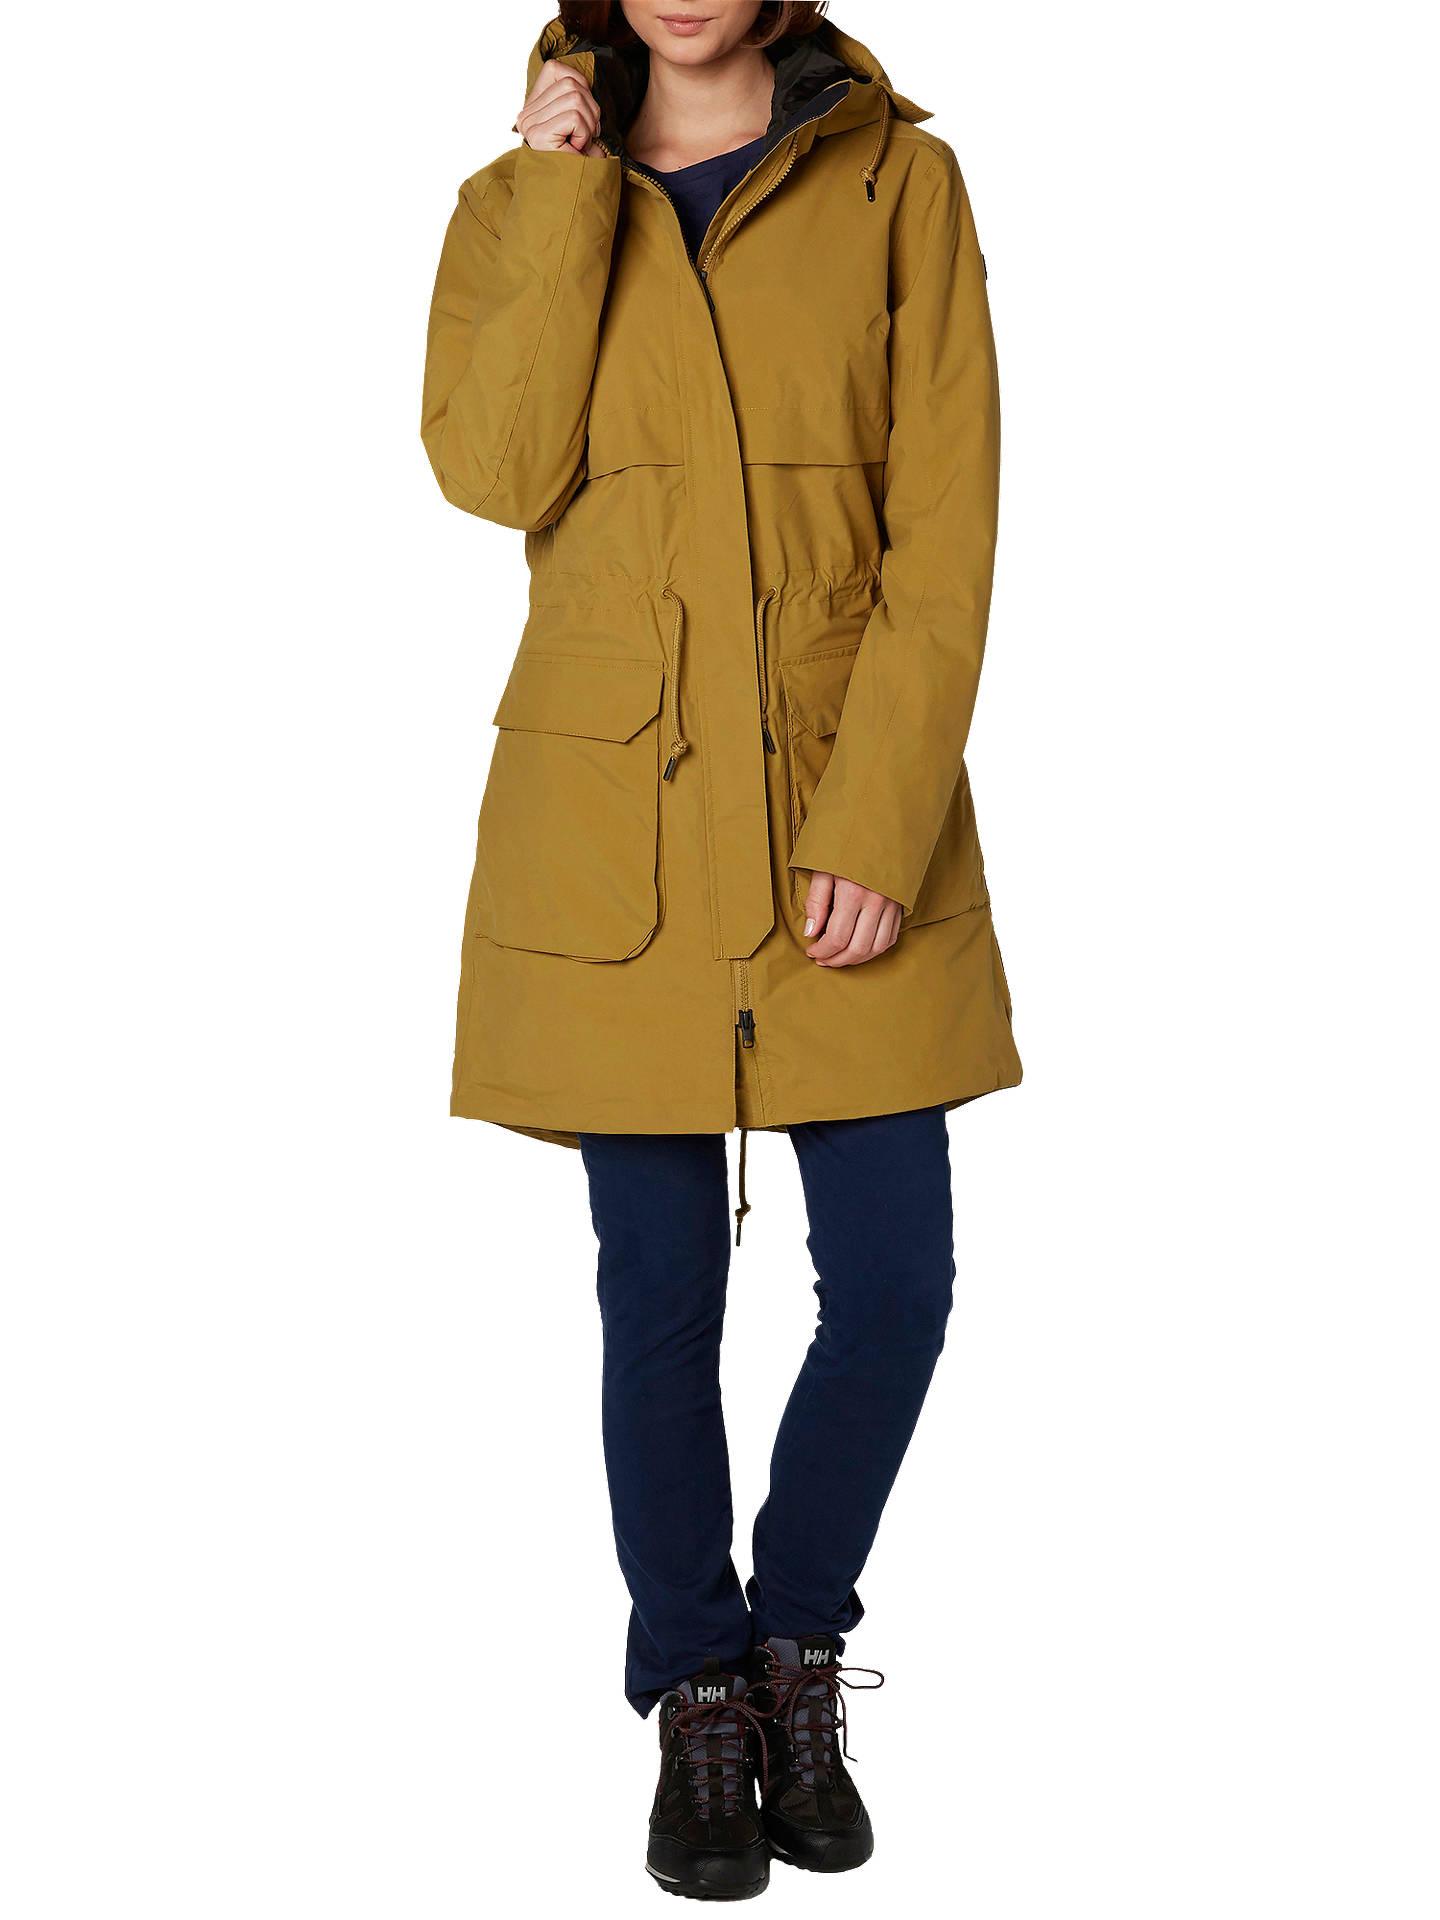 7329b530ad16d Buy Helly Hansen Boyne Waterproof Women's Parka Jacket, Brown, S Online at  johnlewis.